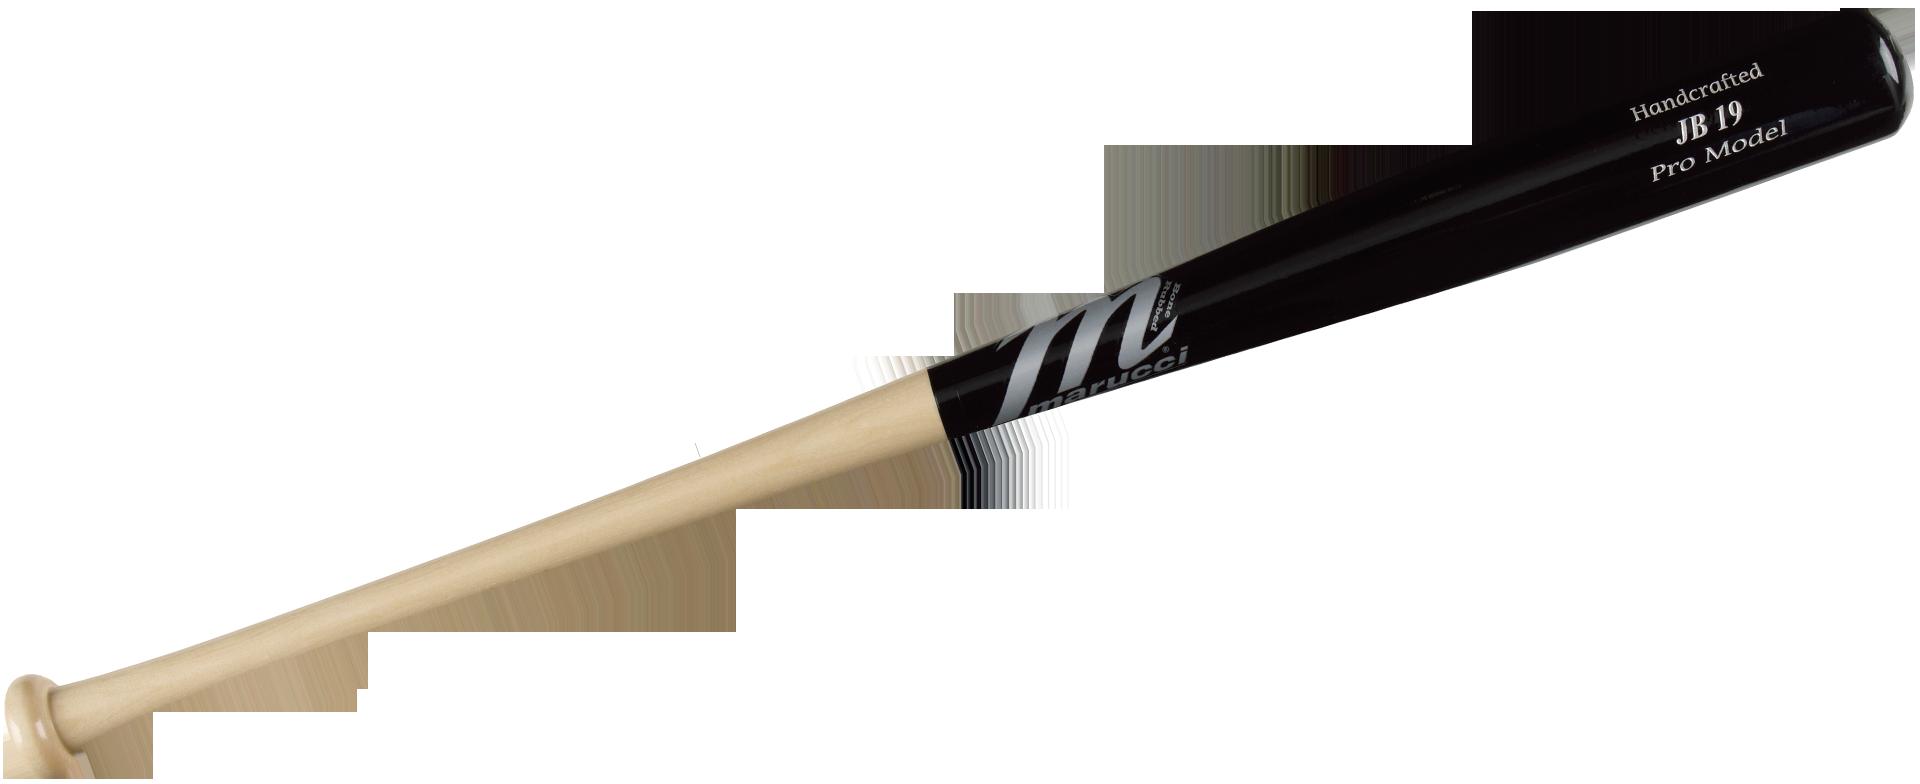 1920x784 Baseball Bats